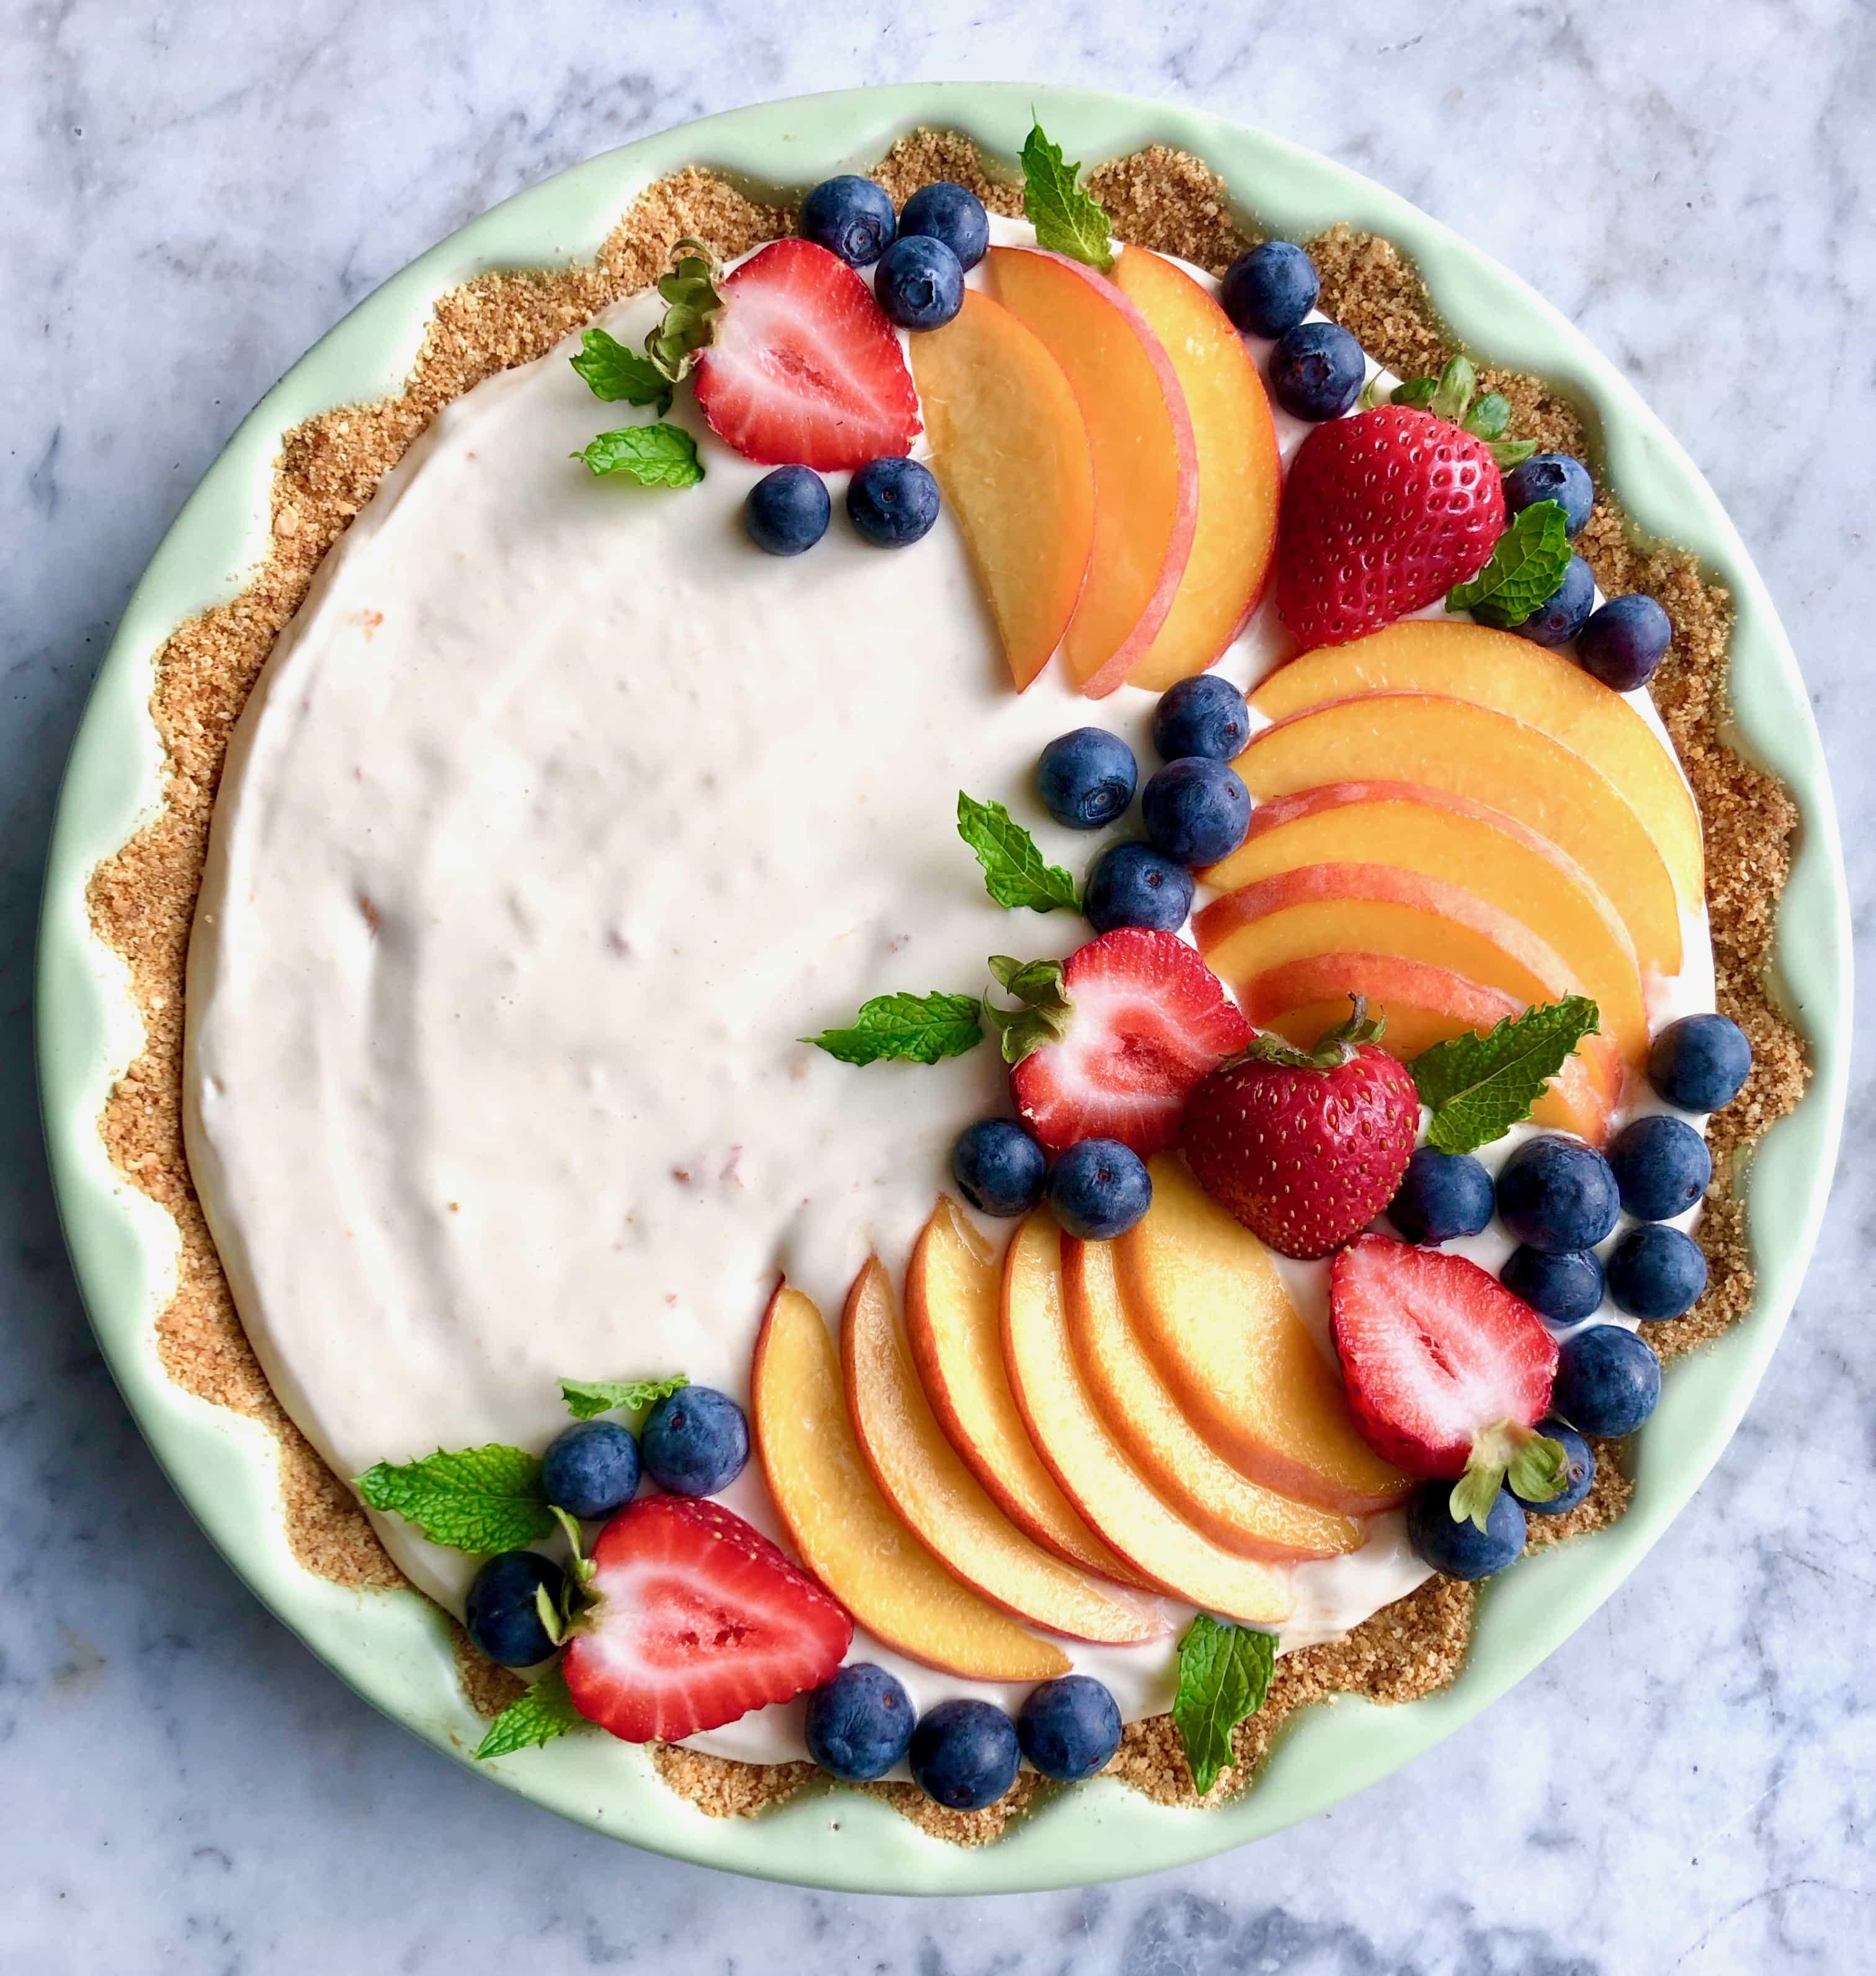 peach tart with graham cracker crust in a green tart dish